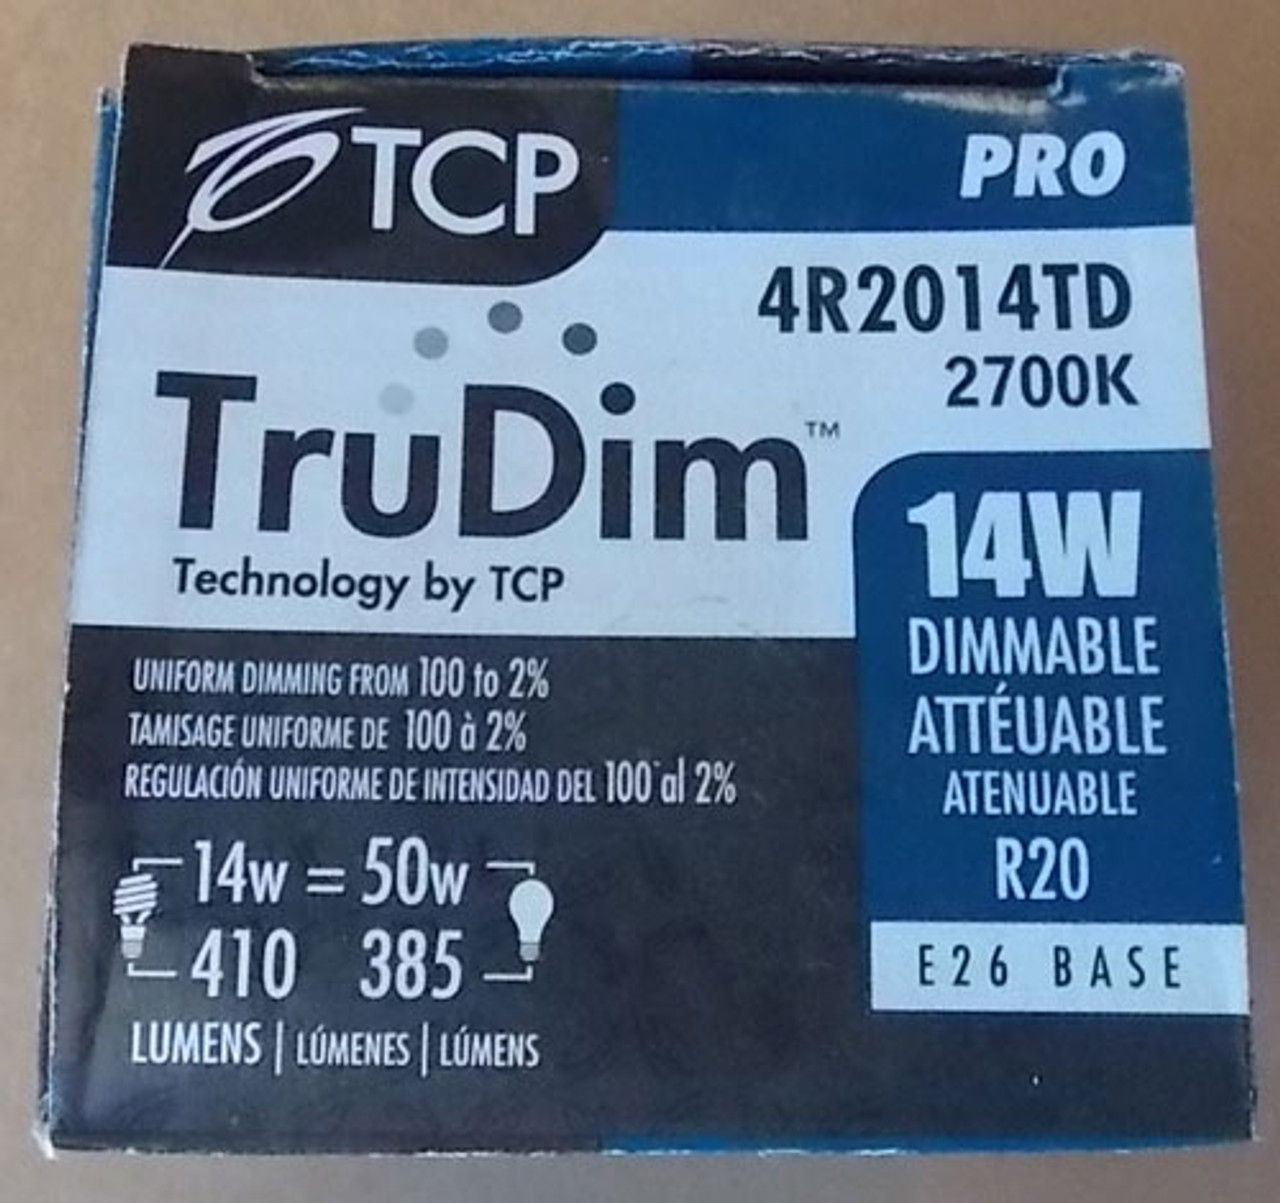 TCP TruDim 4R2014TD 14W 120V 2700K E26 Base Dimmable Light Bulb - New